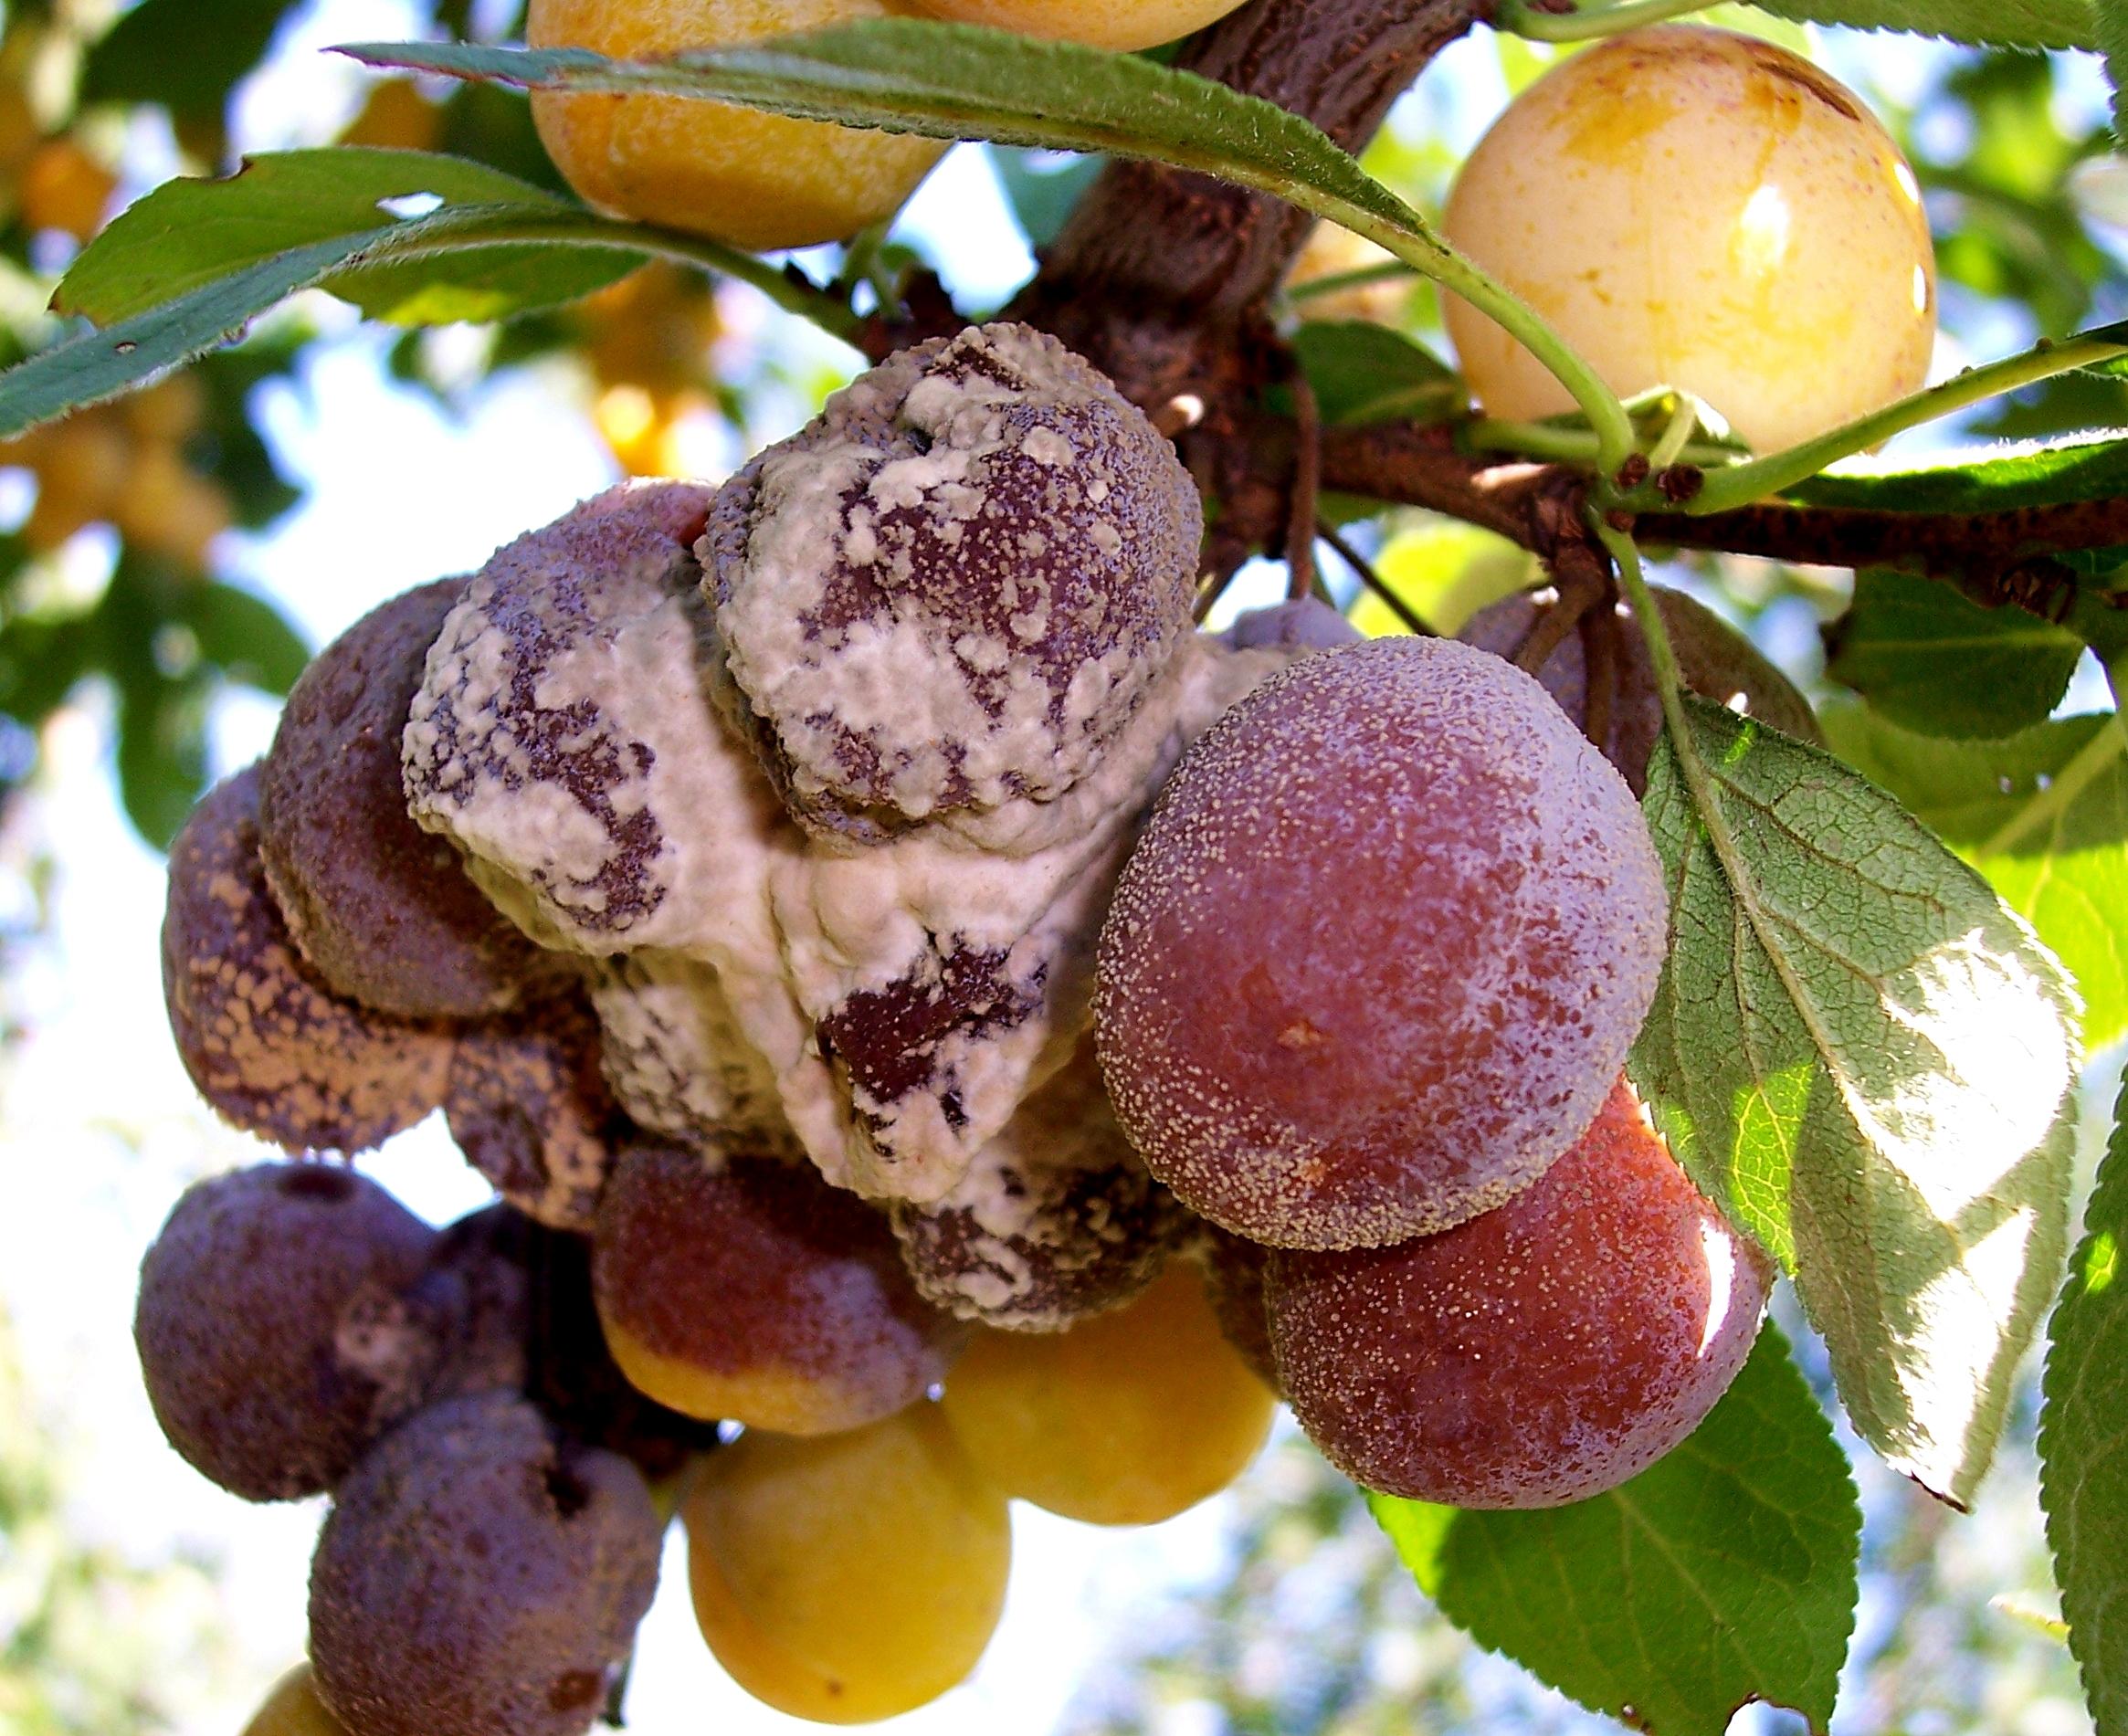 07_Fruchtmonilia-Mirabellen